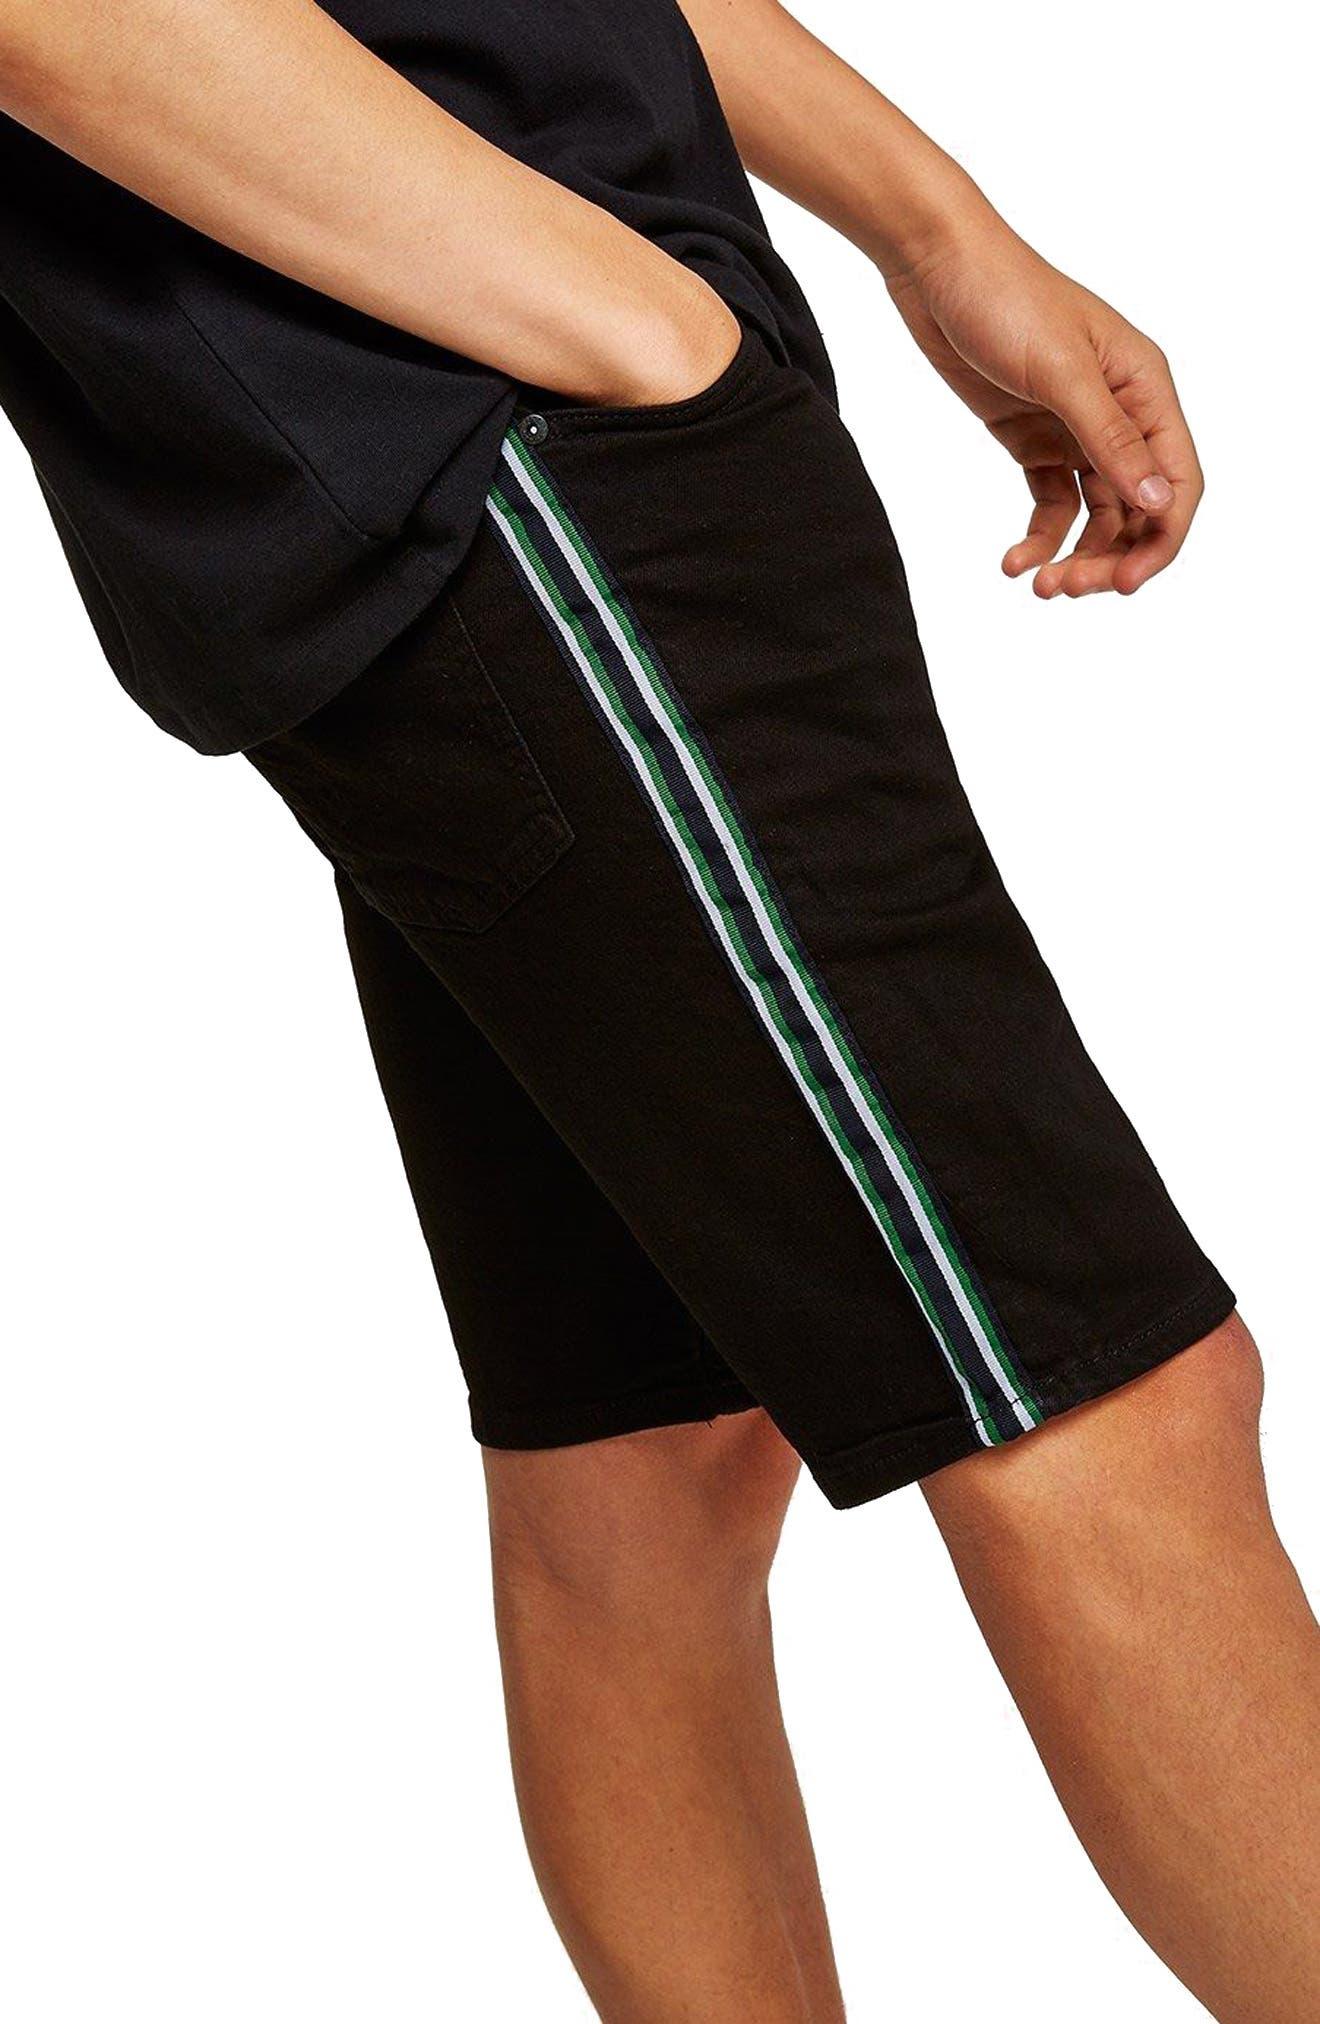 Tape Stretch Skinny Fit Denim Shorts,                             Alternate thumbnail 3, color,                             Black